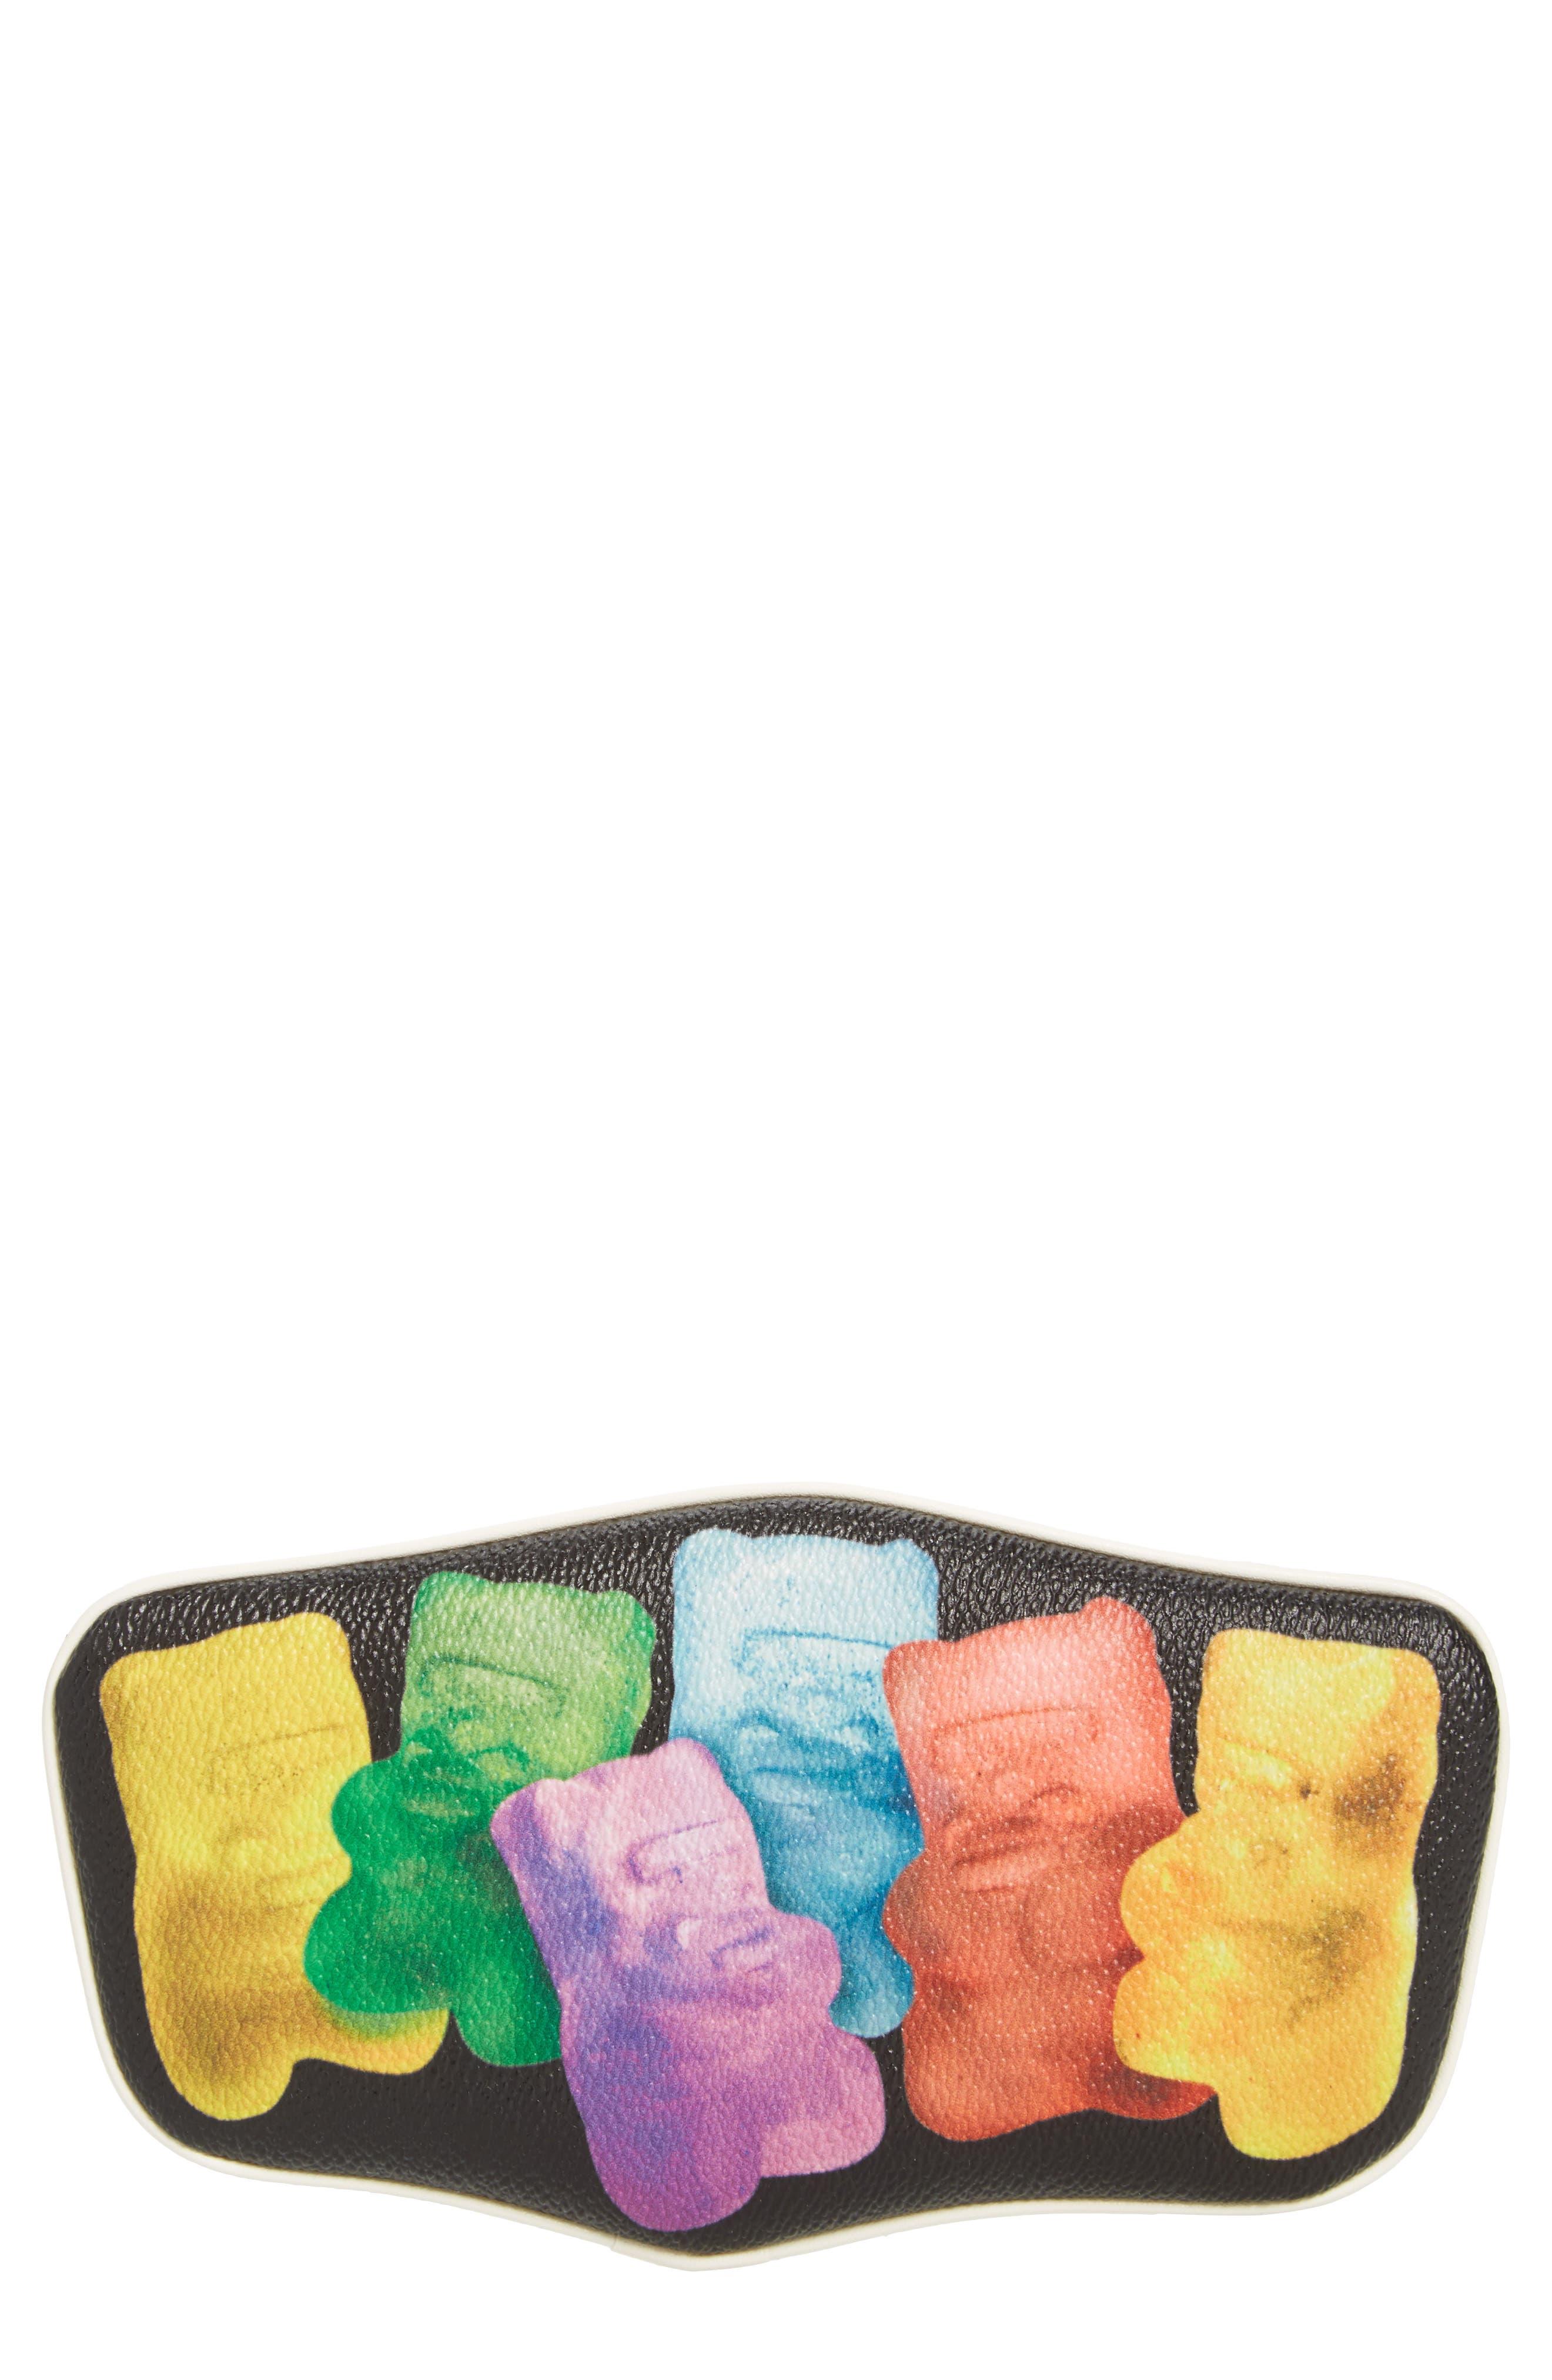 Gummy Bears Coin Purse,                             Main thumbnail 1, color,                             001